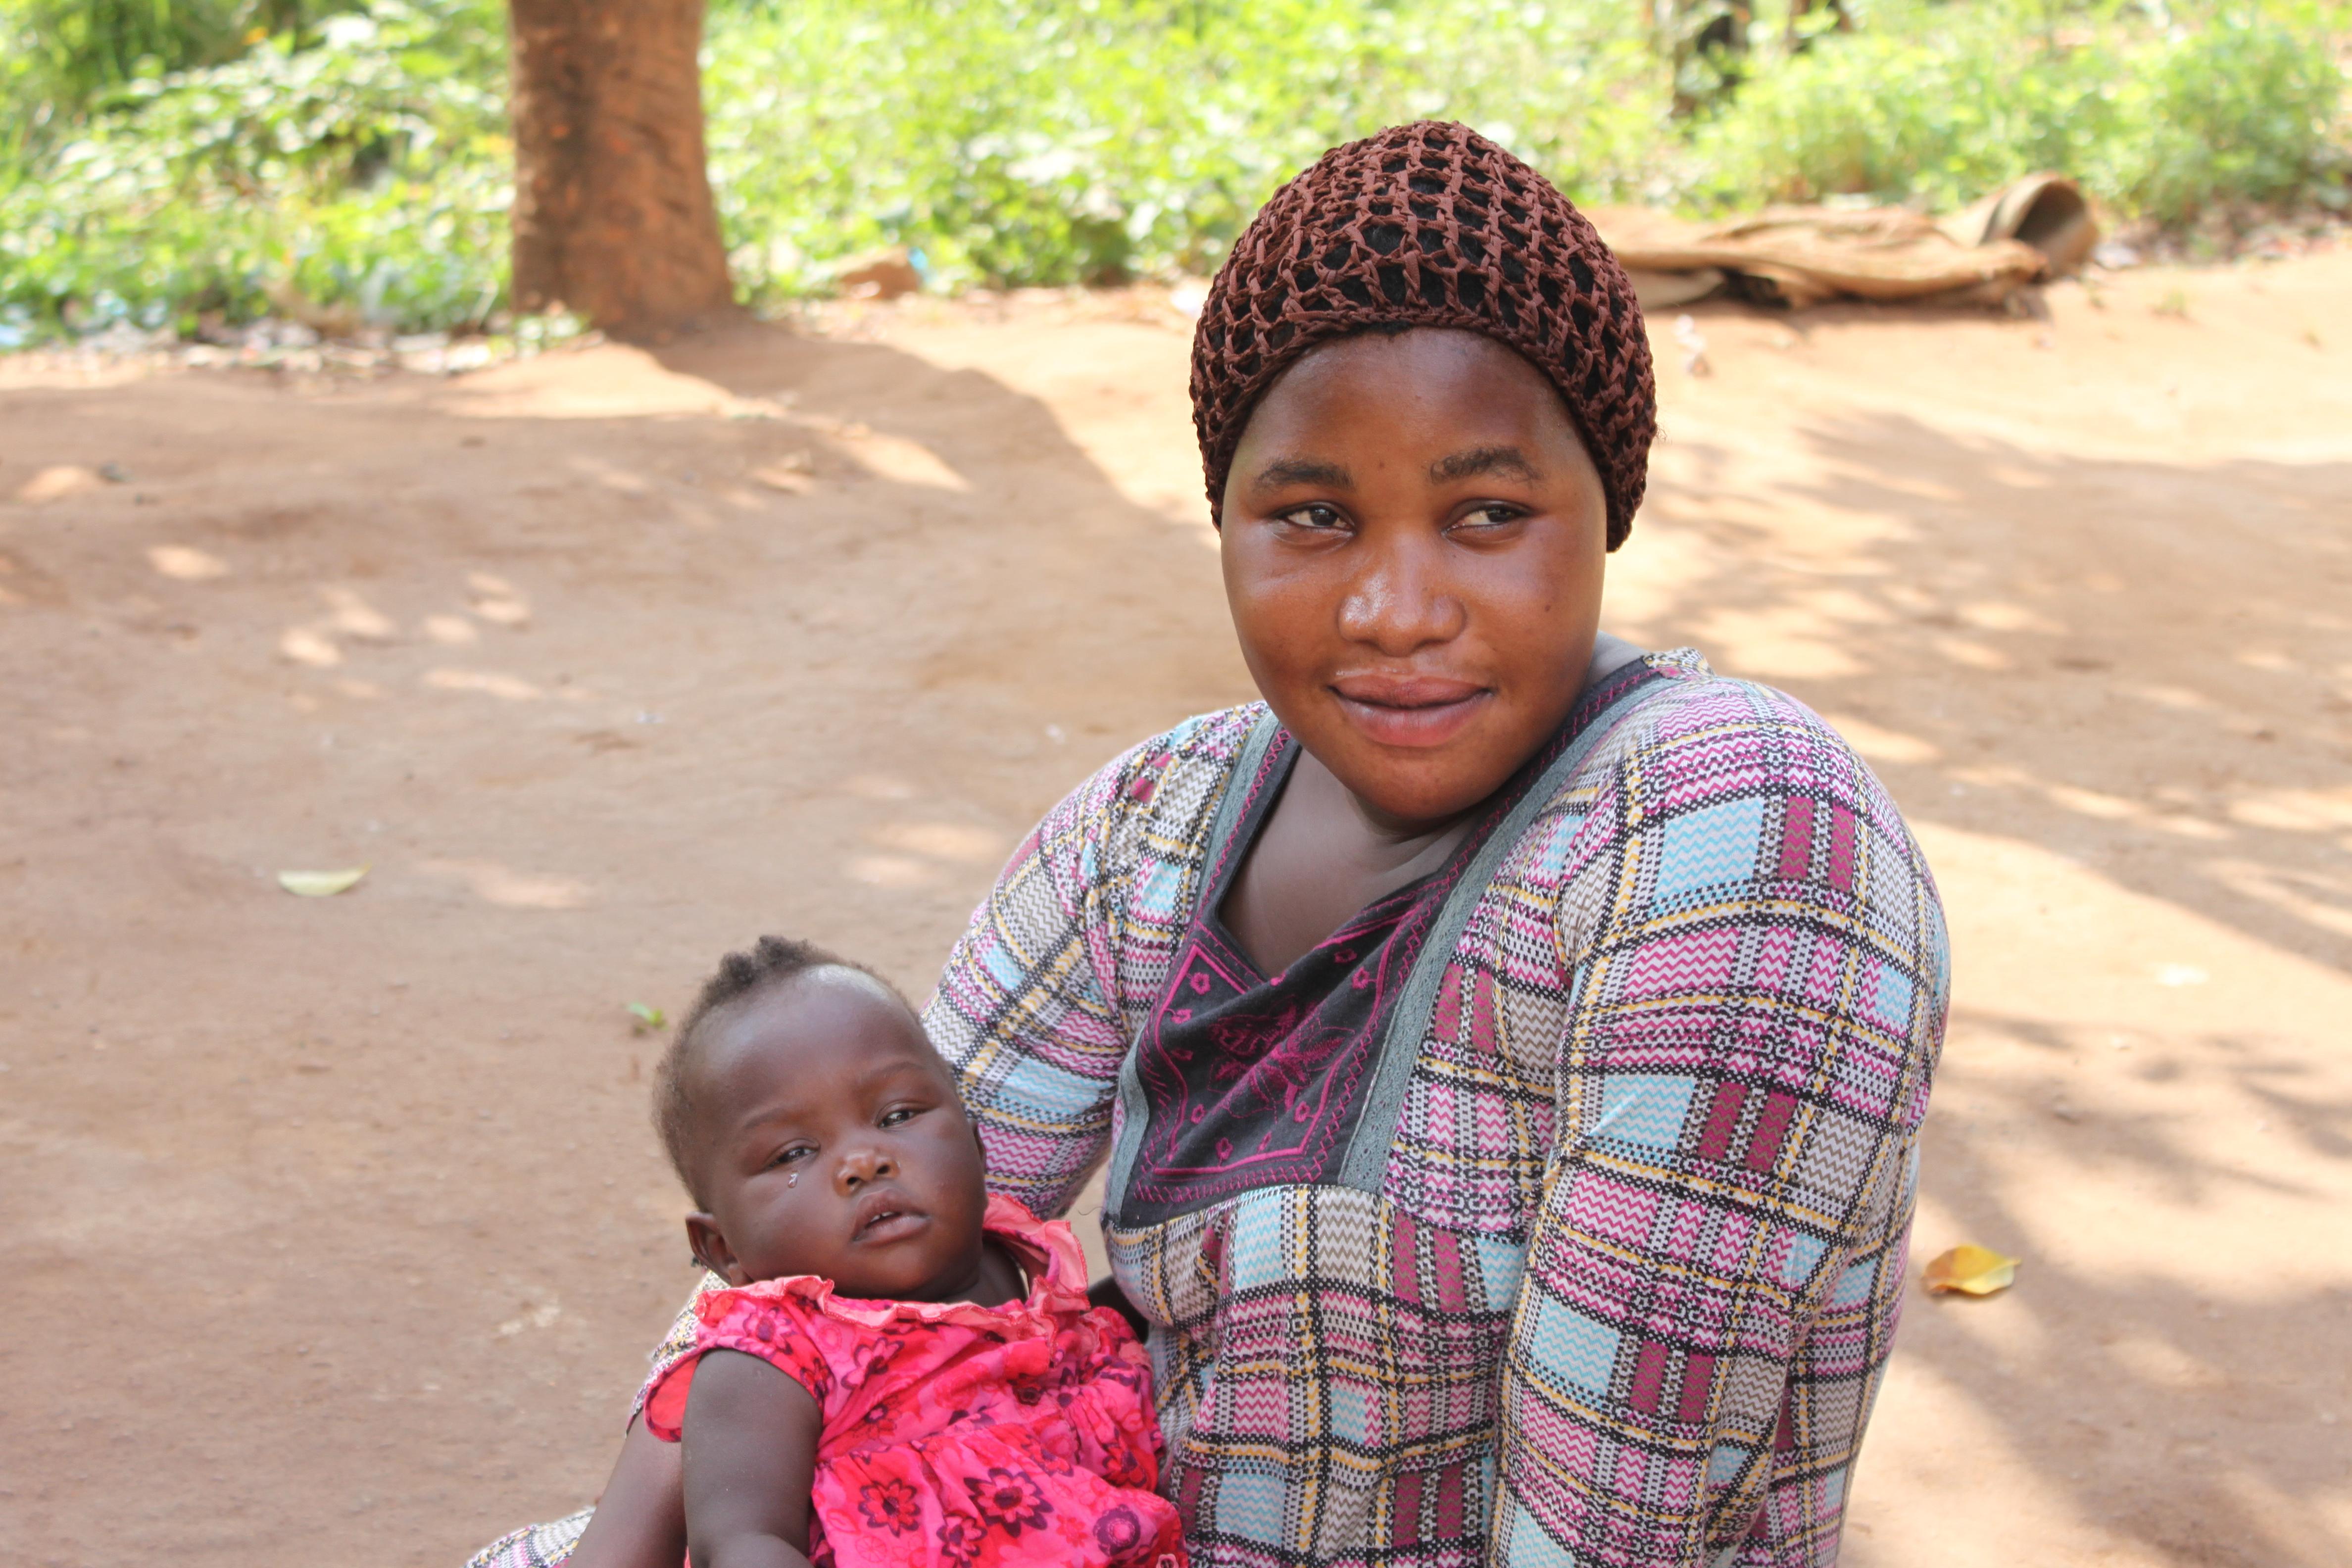 Halima (23) with her daughter Rashita (6 months), the latest addition to Halima's six children.